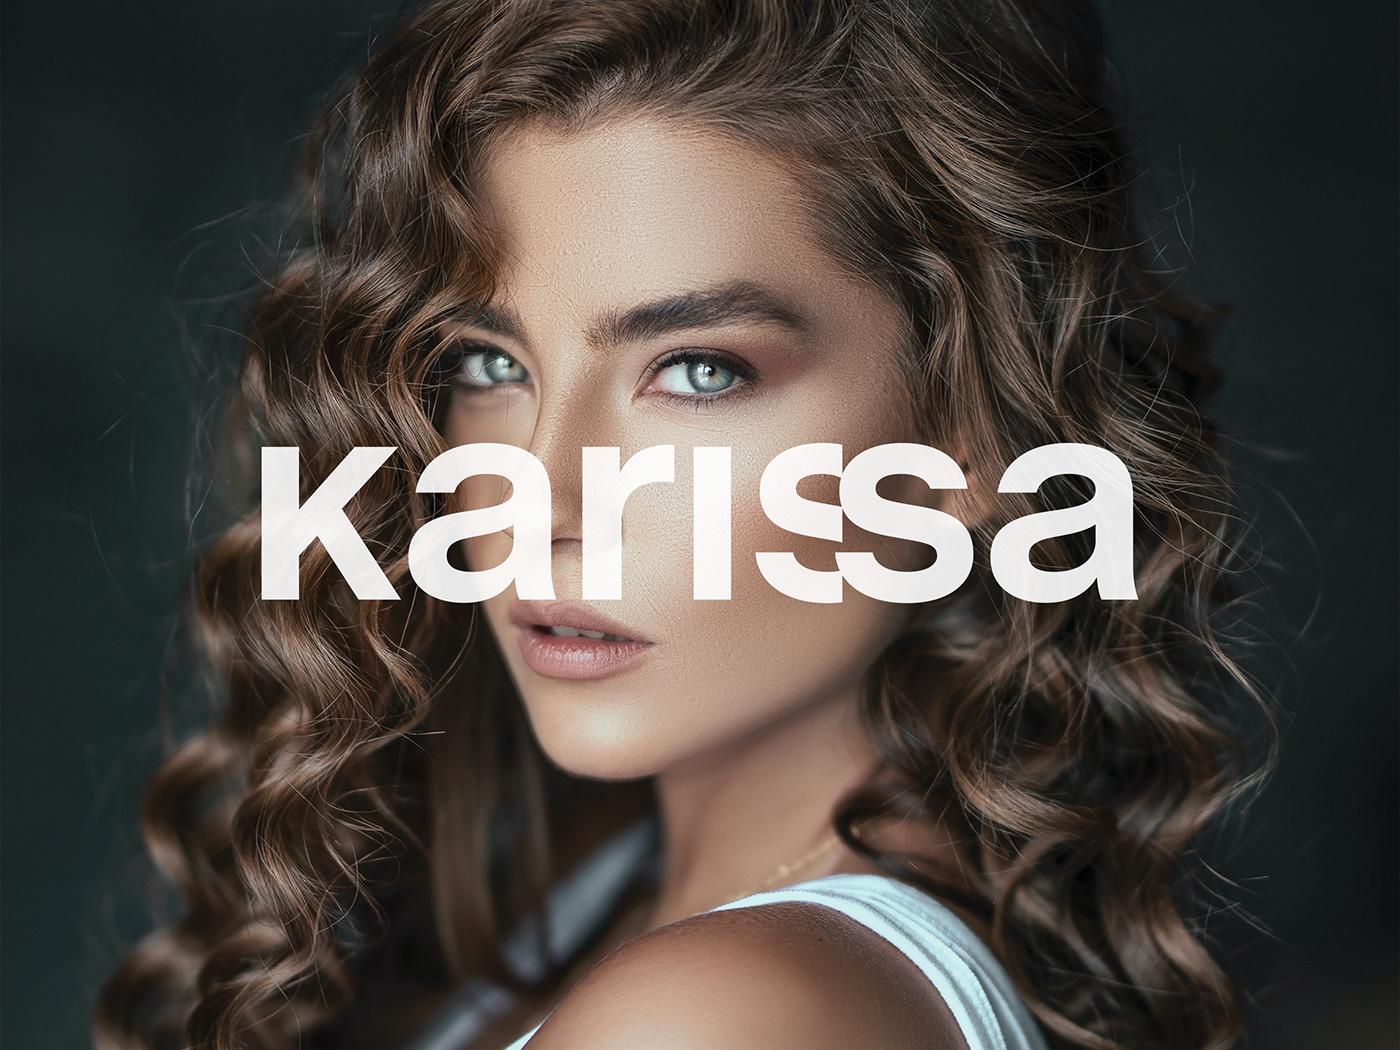 beauty beauty salon Fashion  Hair Salon hairdresser Hairstylist logo Logotype modern woman